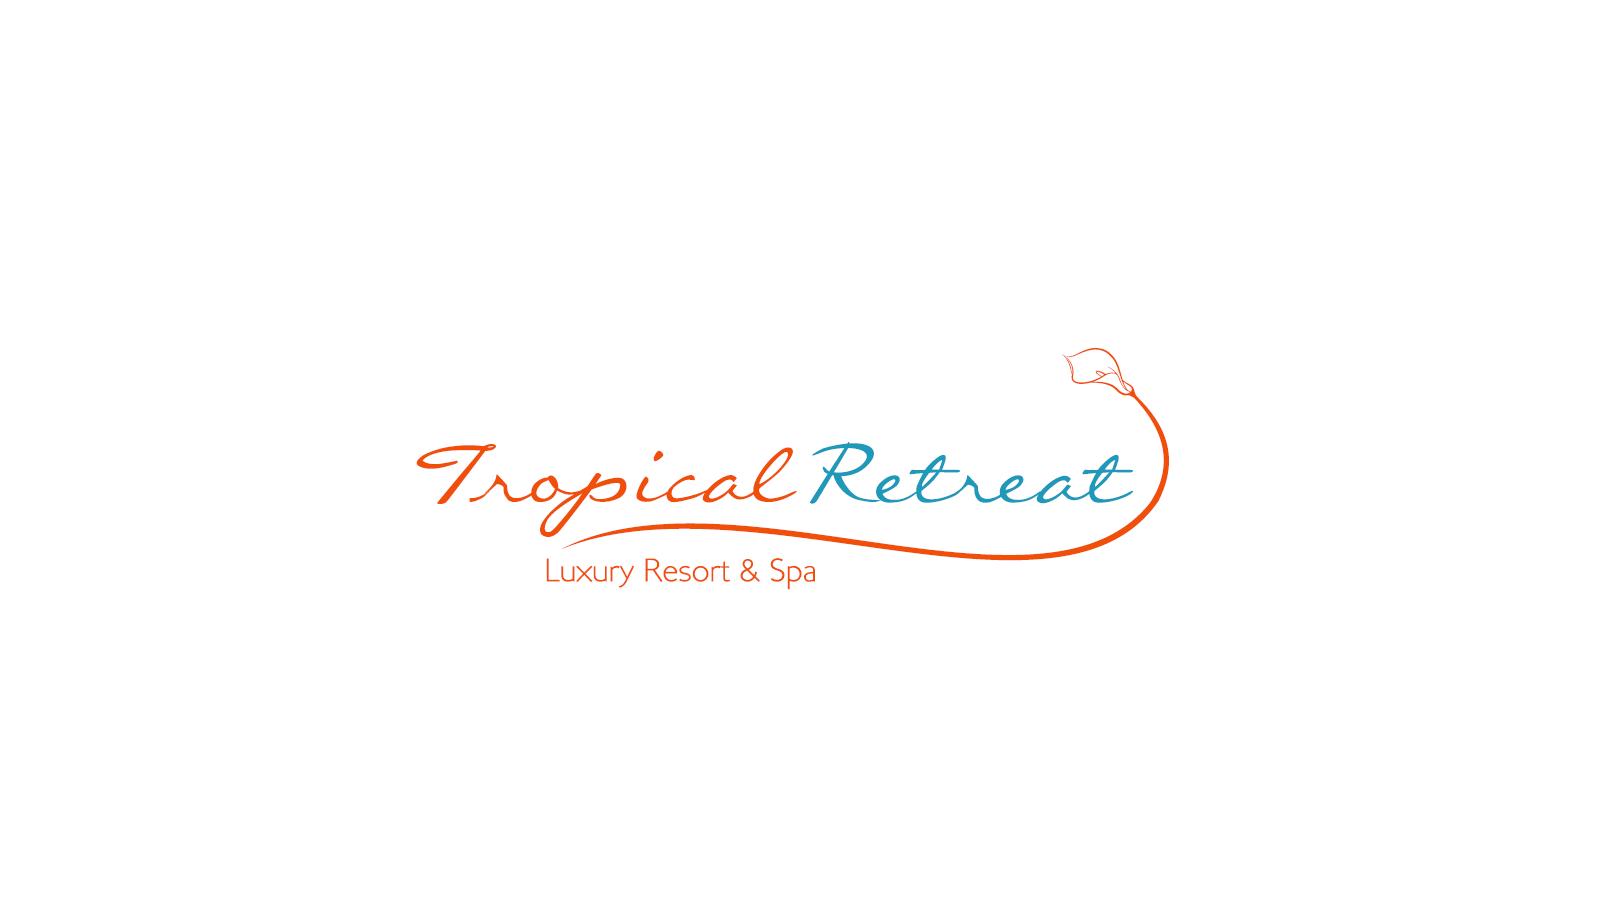 Tropical Retreat Luxury Spa & Resort - Igatpuri - Nashik Image